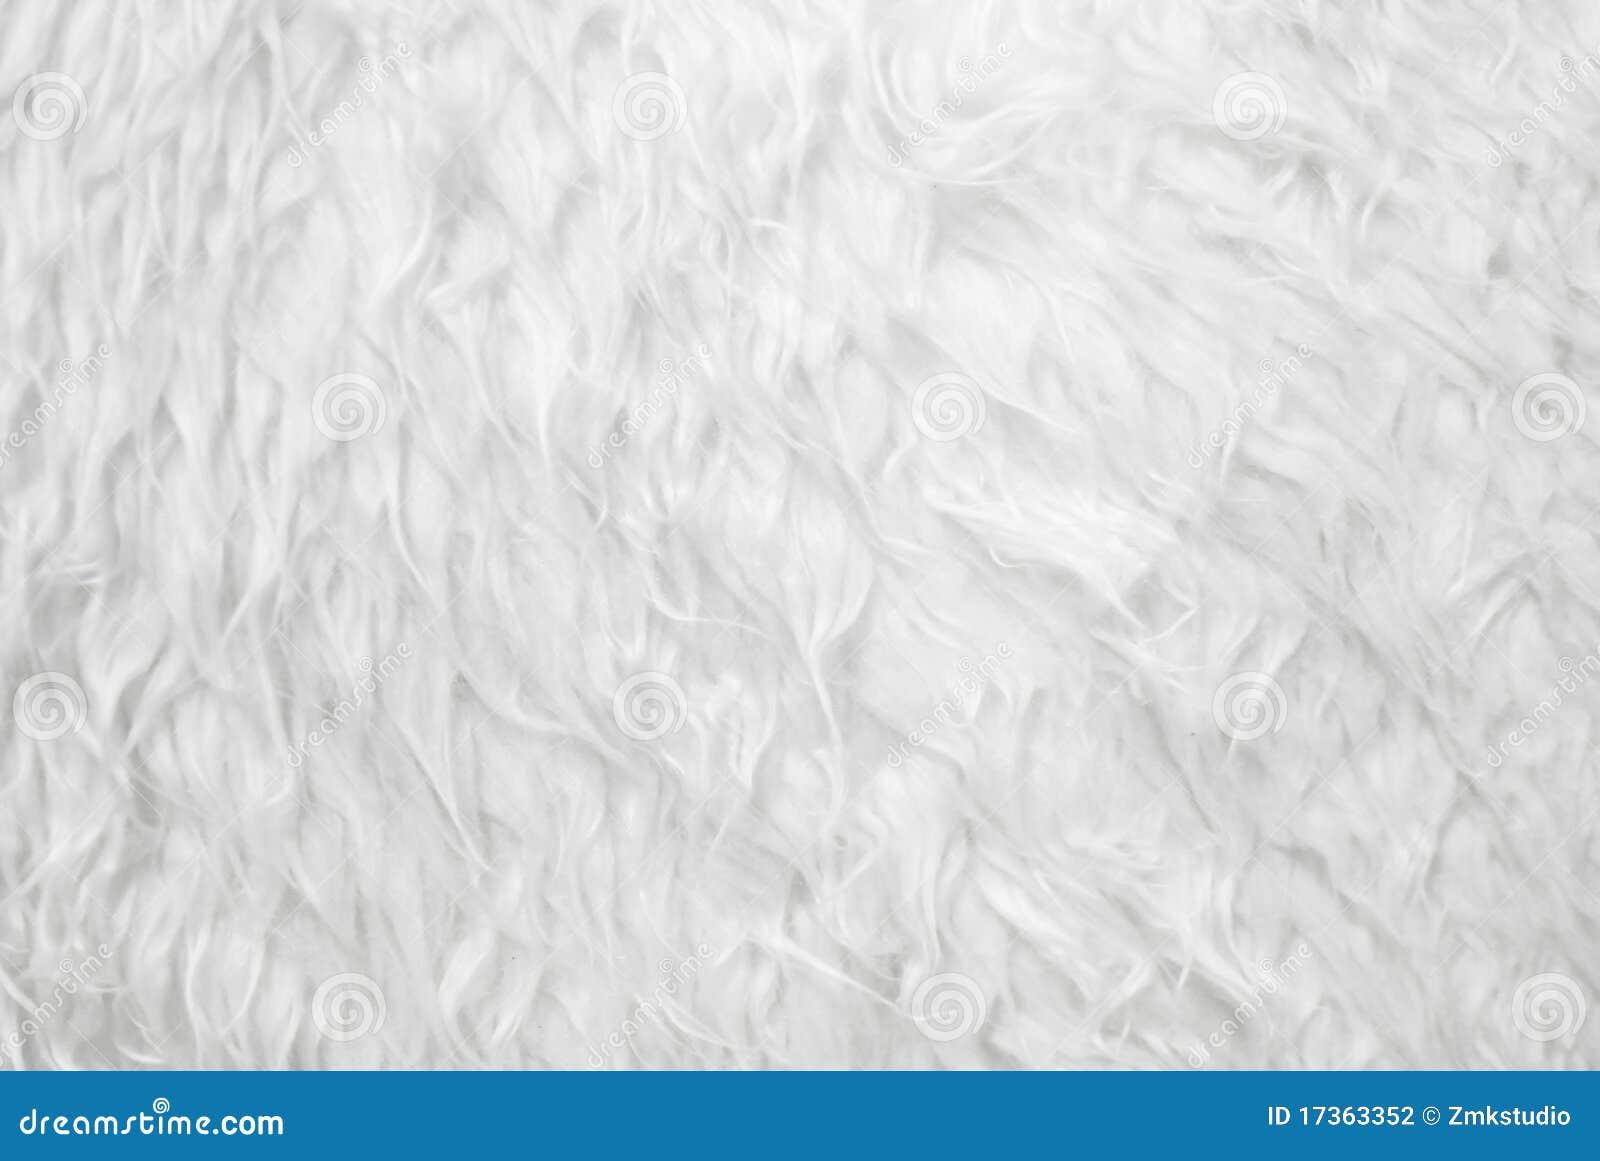 White Fur Texture Closeup Stock Photography Image 17363352